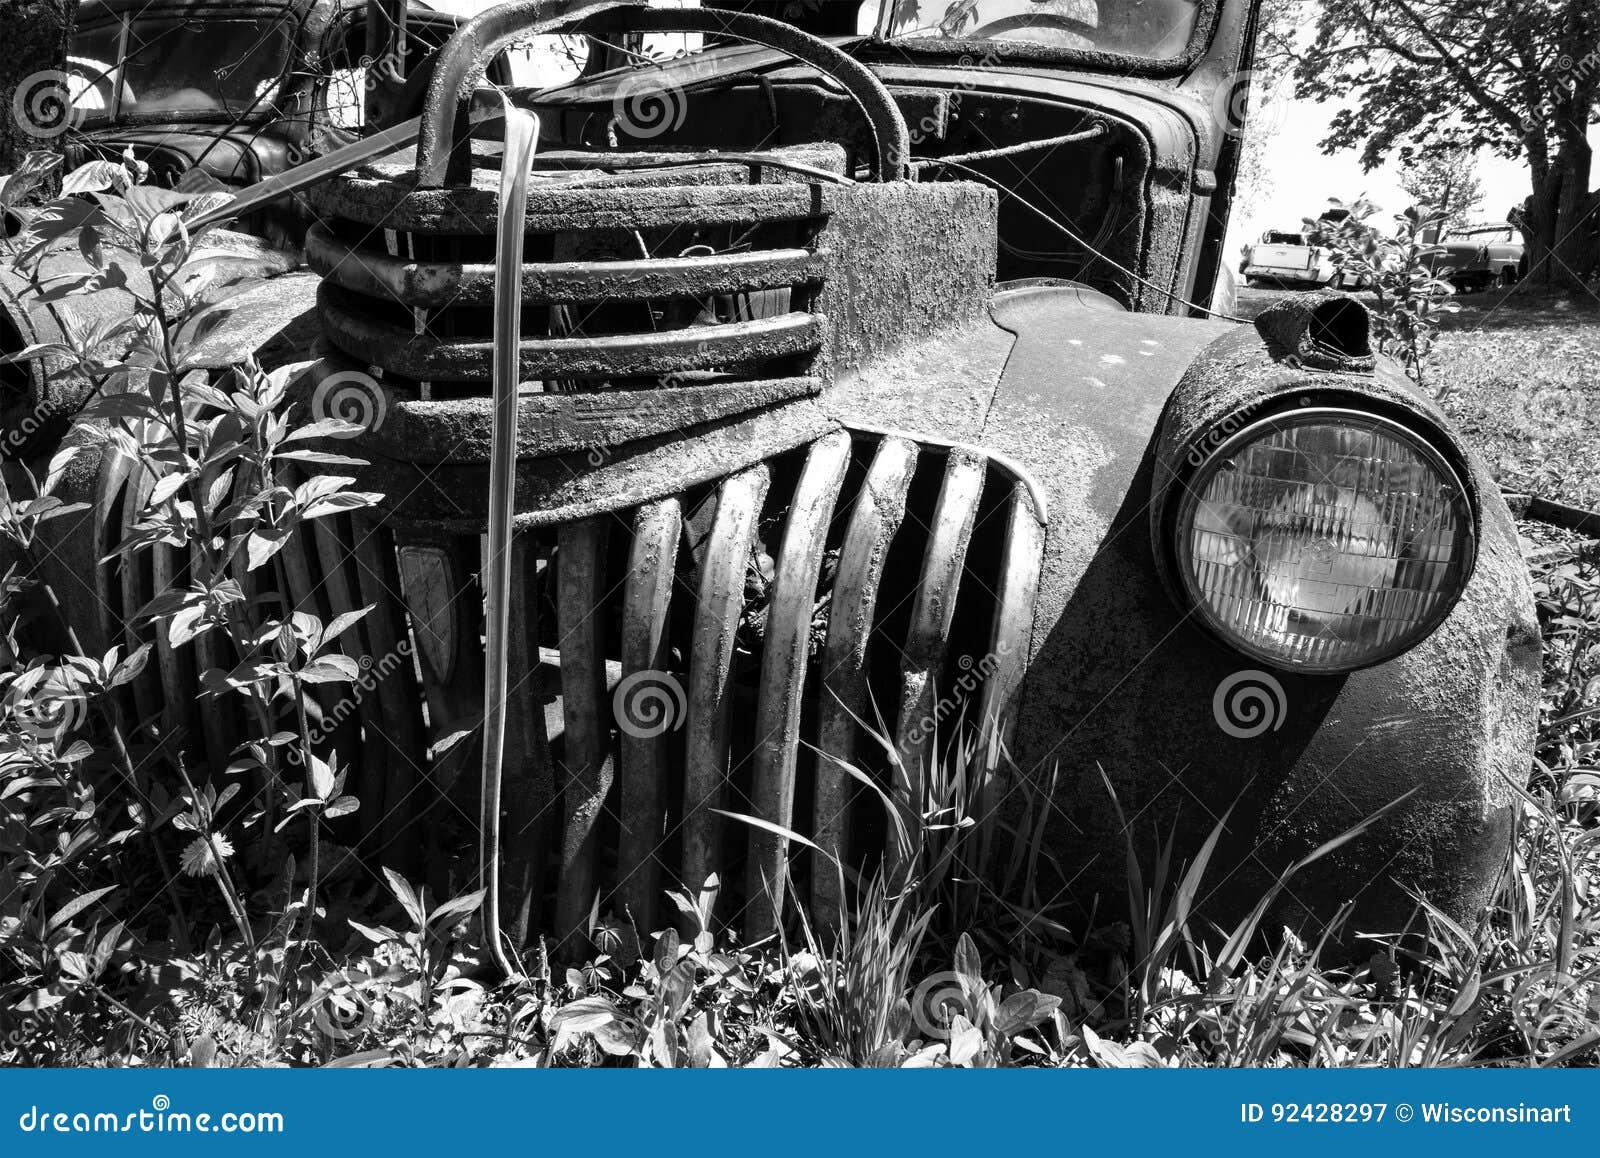 Old Classic Pickup Truck, Junkyard Stock Image - Image of classic ...